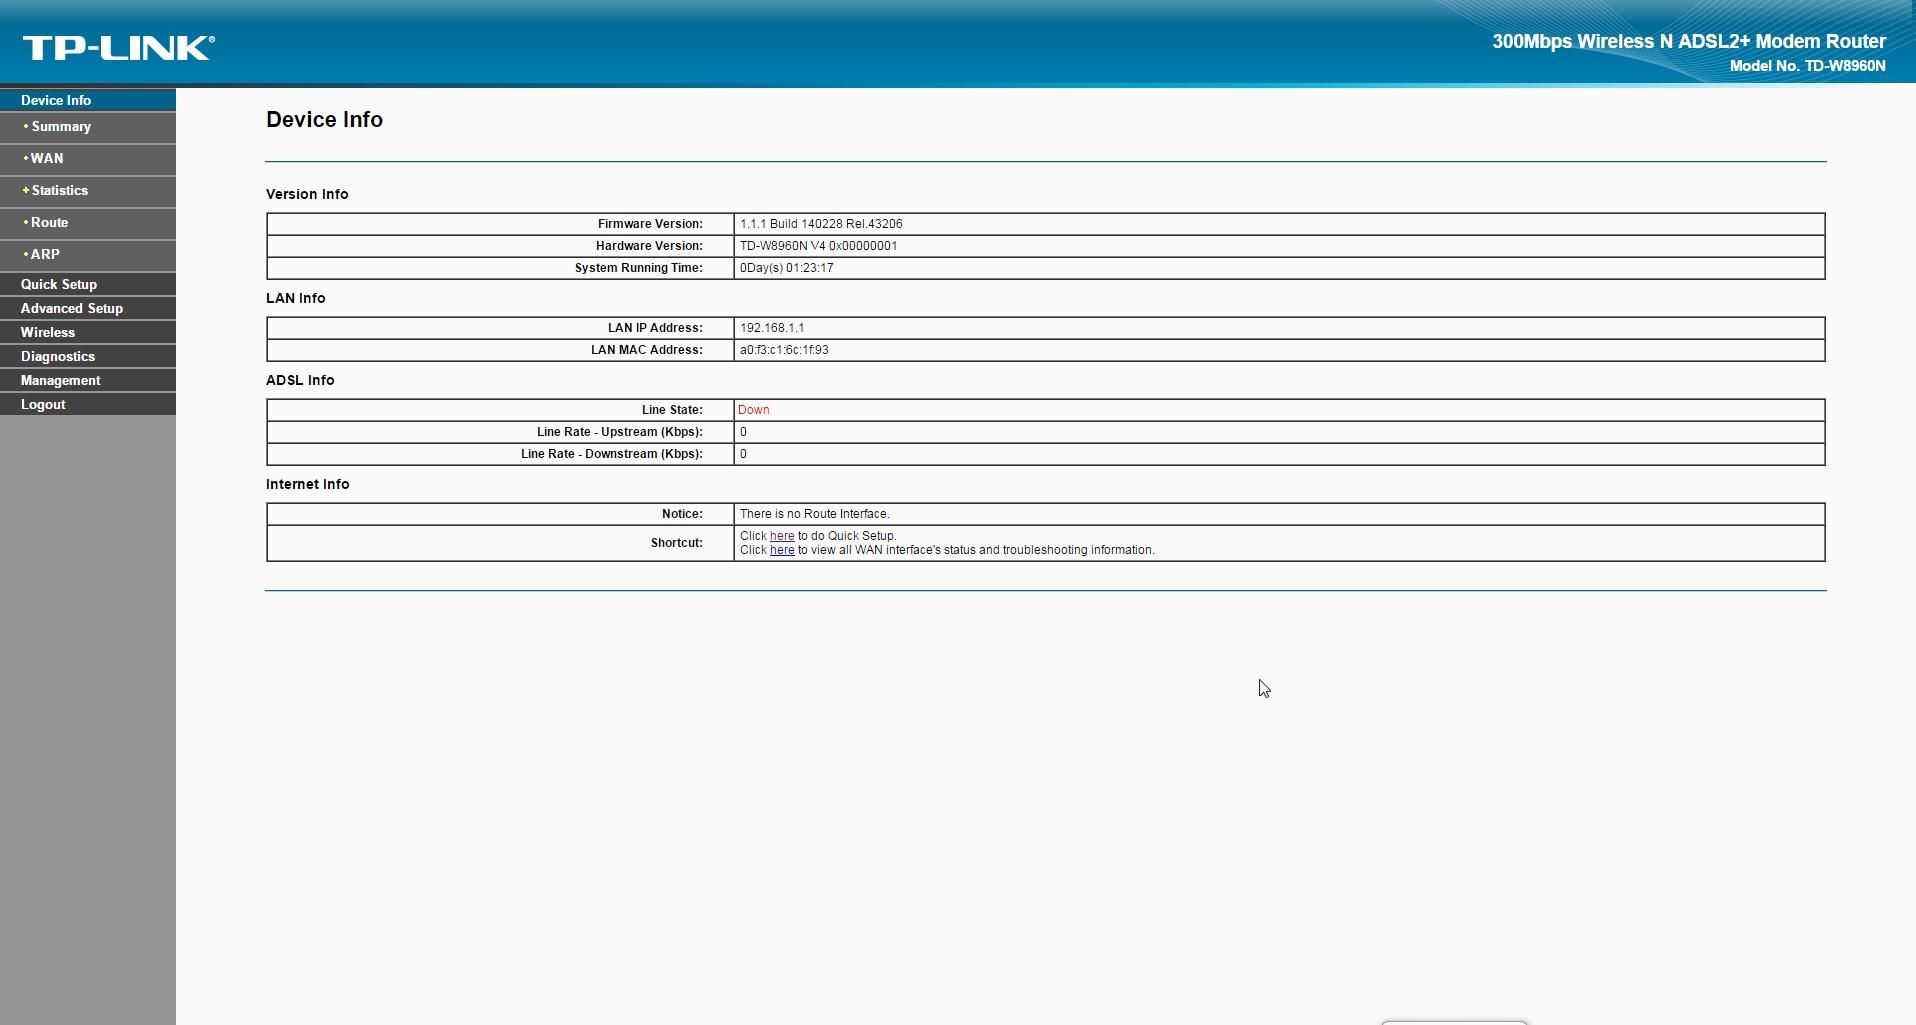 Обзор беспроводного маршрутизатора TP-LINK TD-W8960N